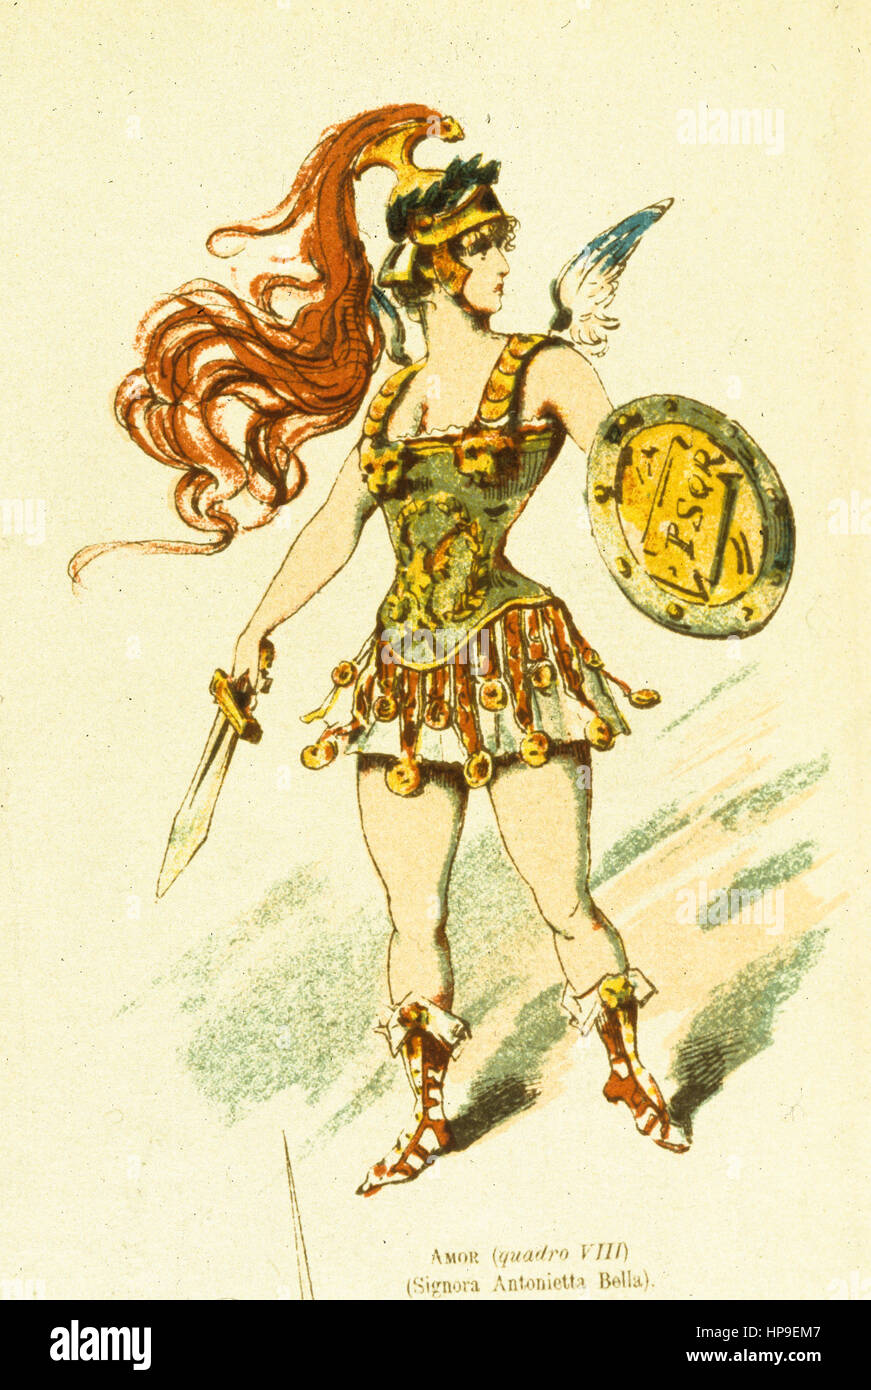 Signora antonietta bella,amor,Luigi manzotti,Museo Teatrale alla Scala Imagen De Stock